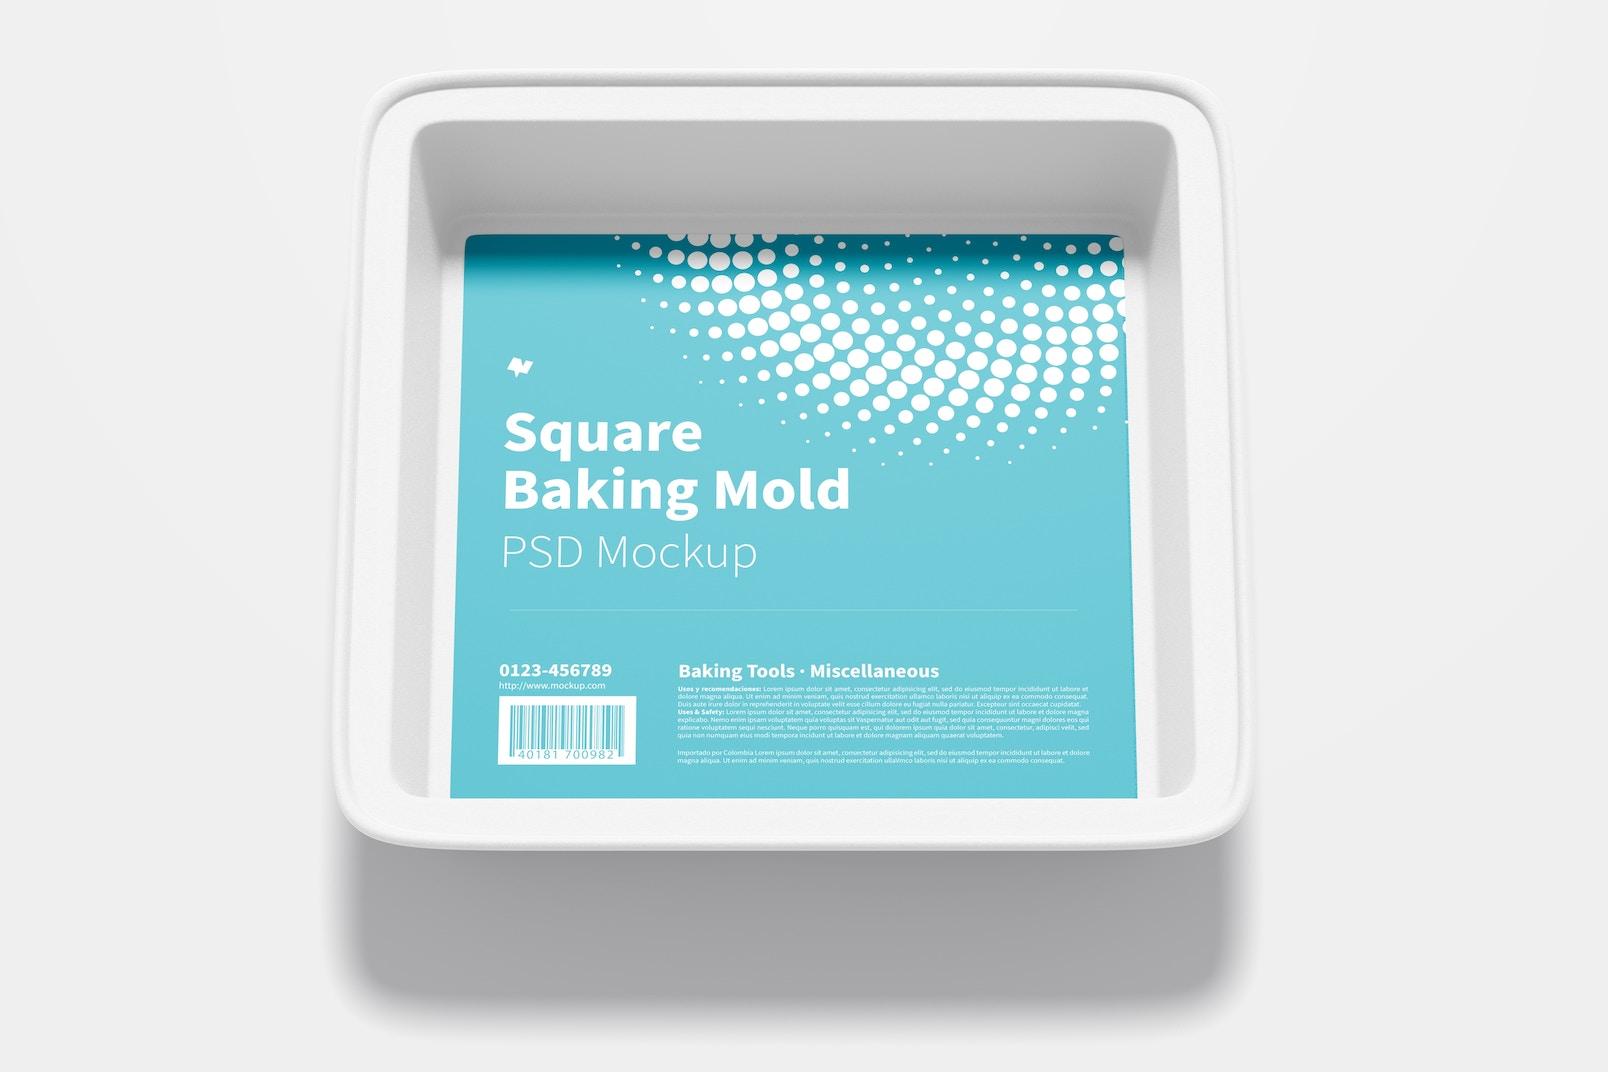 Square Baking Mold Mockup, Top View